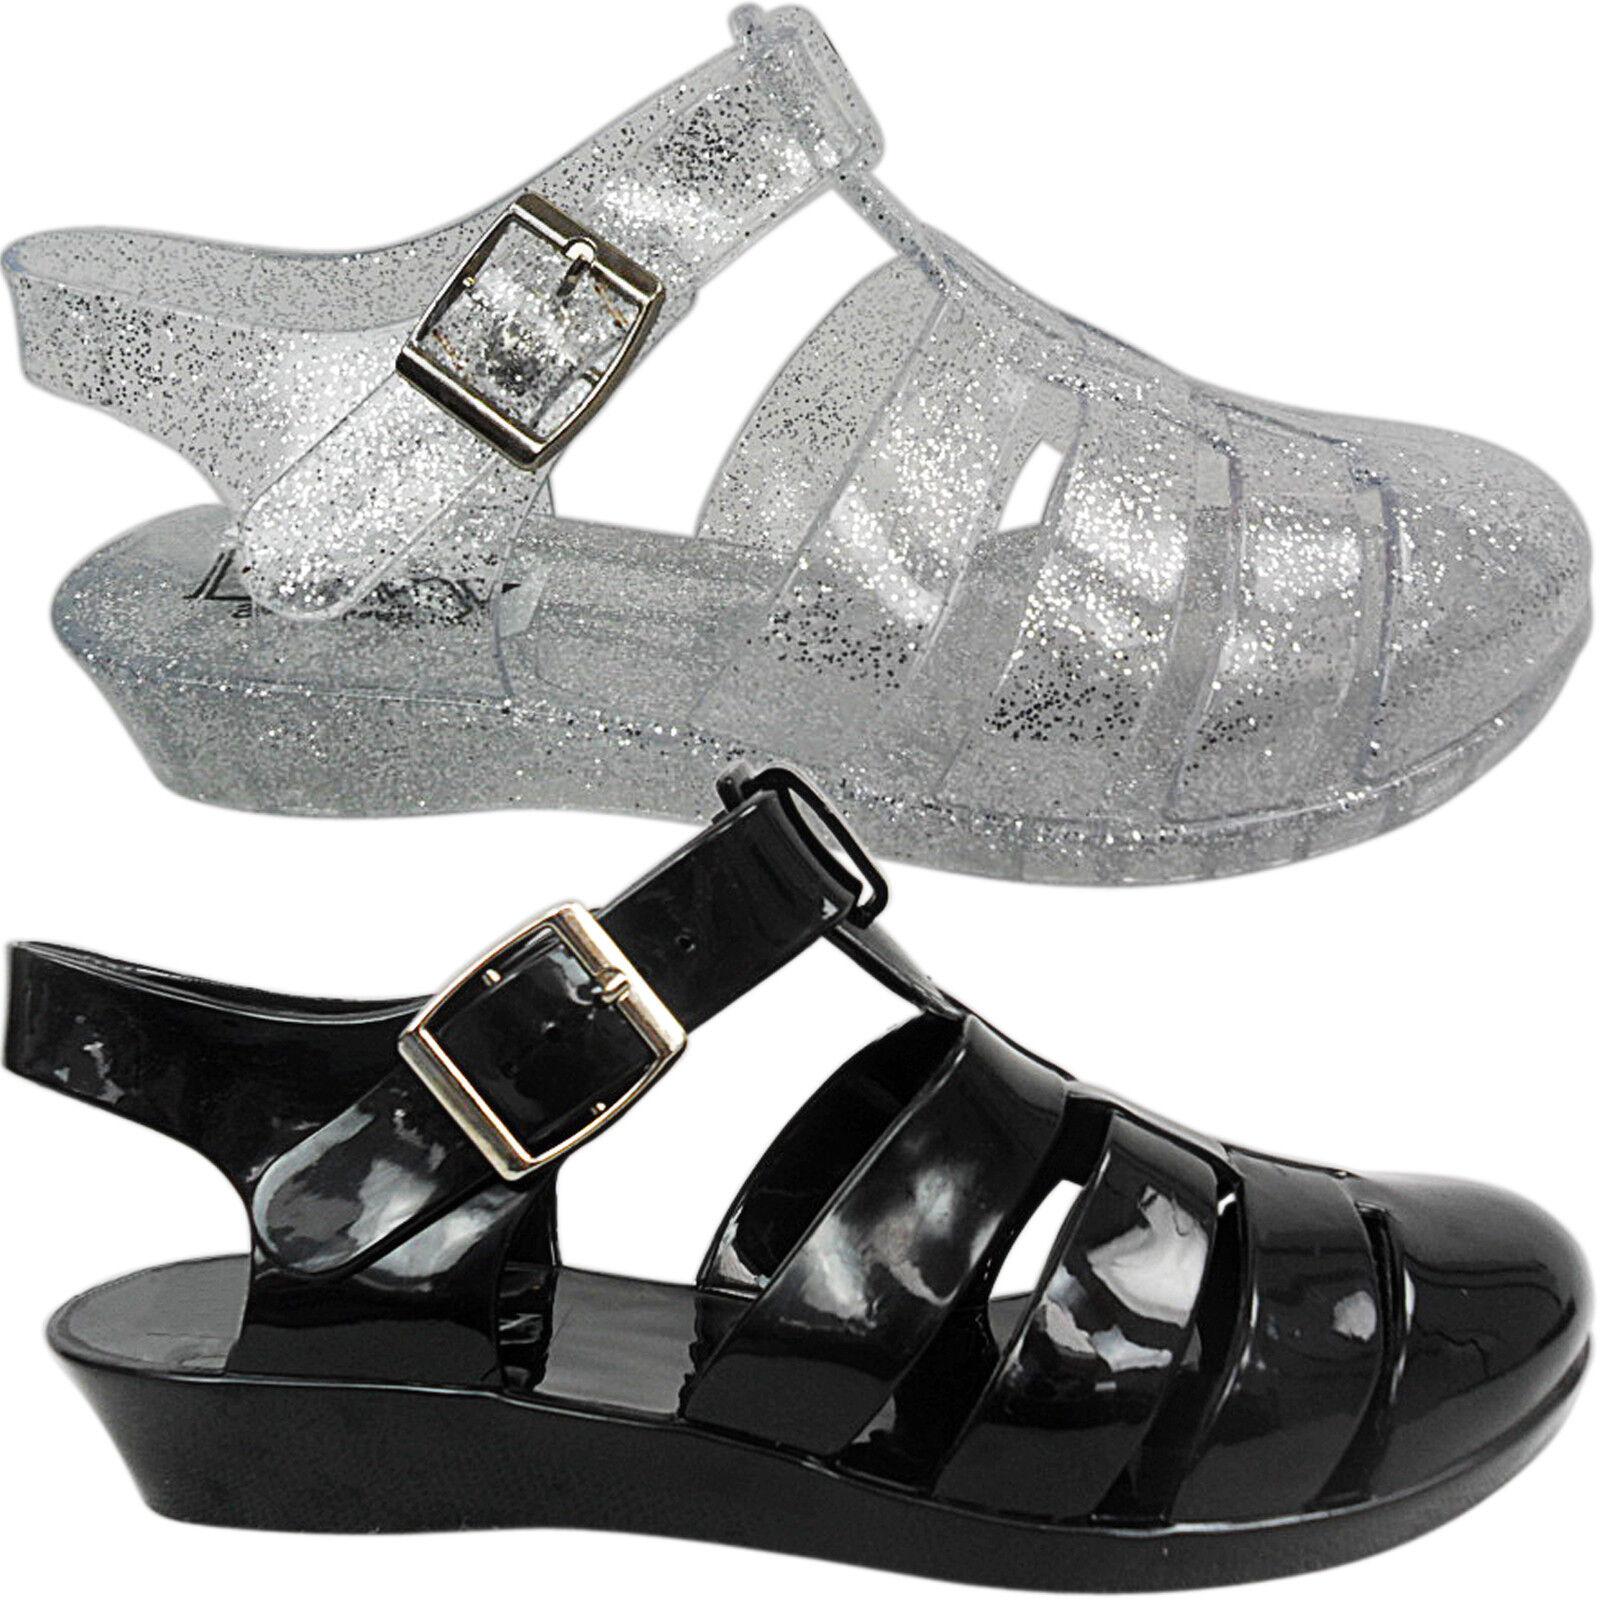 NEW Damenschuhe LADIES LOW WEDGE JELLY BEAN JELLYS SANDALS Schuhe SIZE SUMMER BEACH